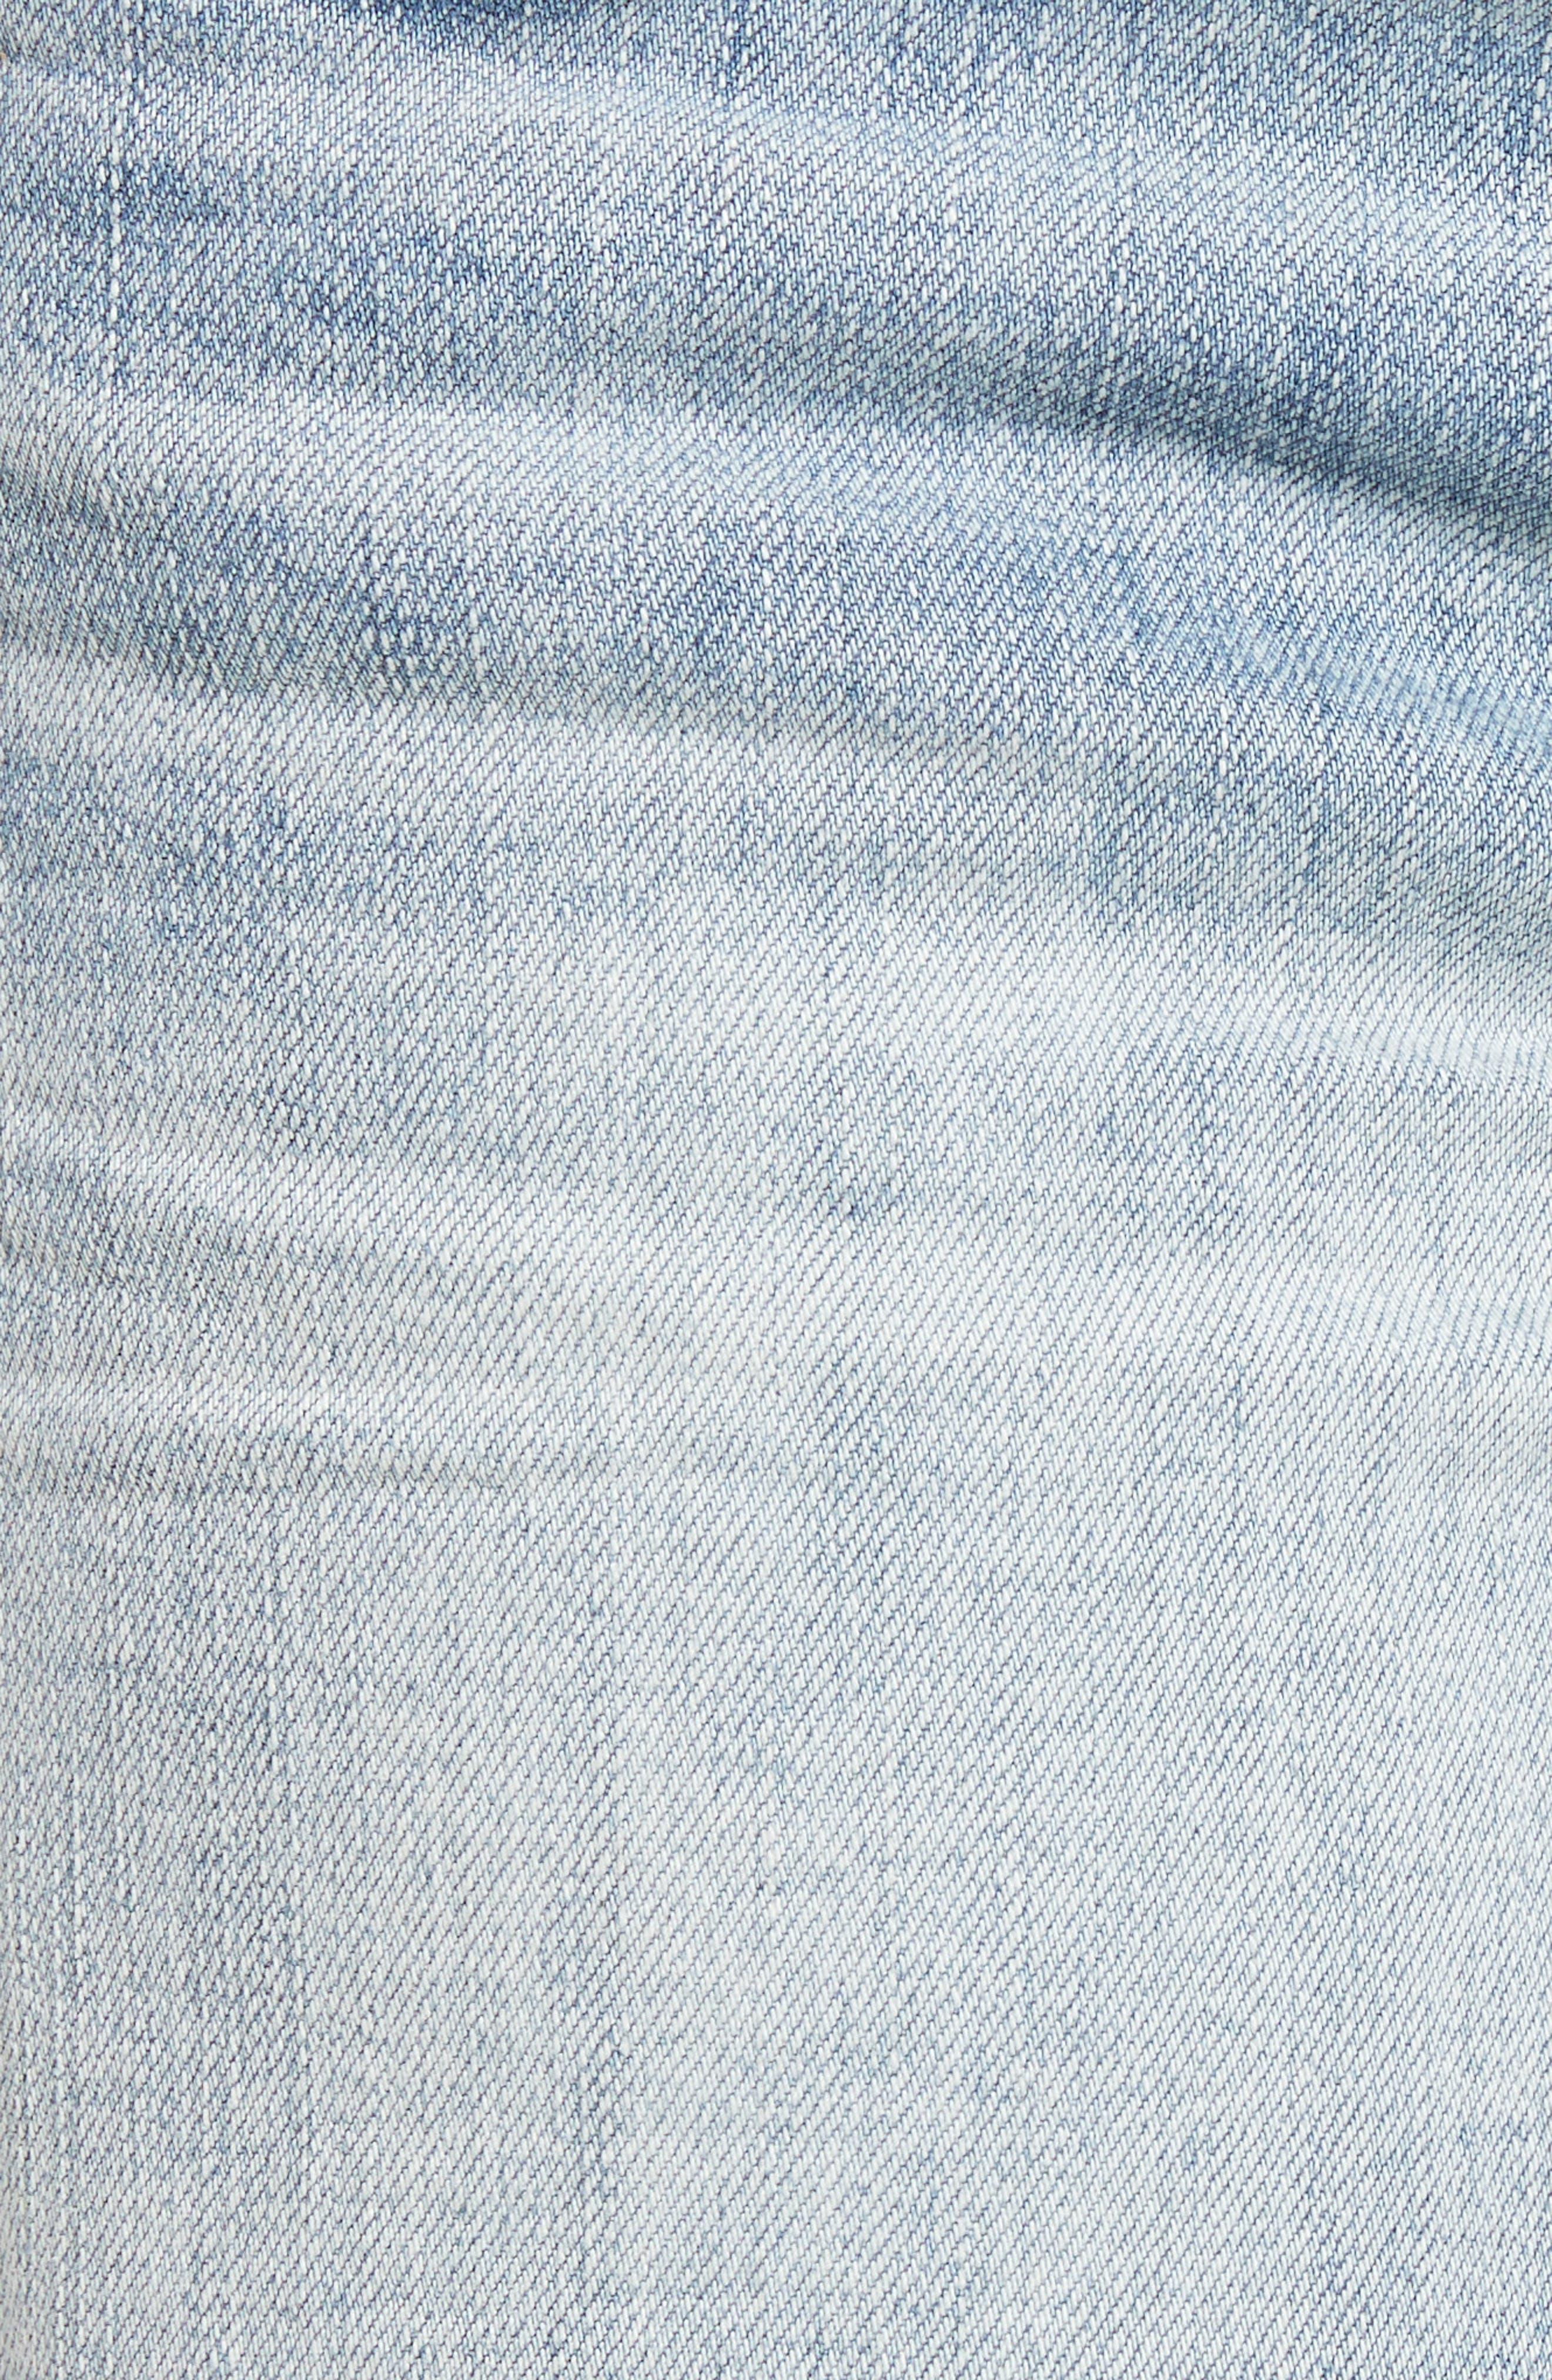 Gidget Cutoff Denim Shorts,                             Alternate thumbnail 6, color,                             470